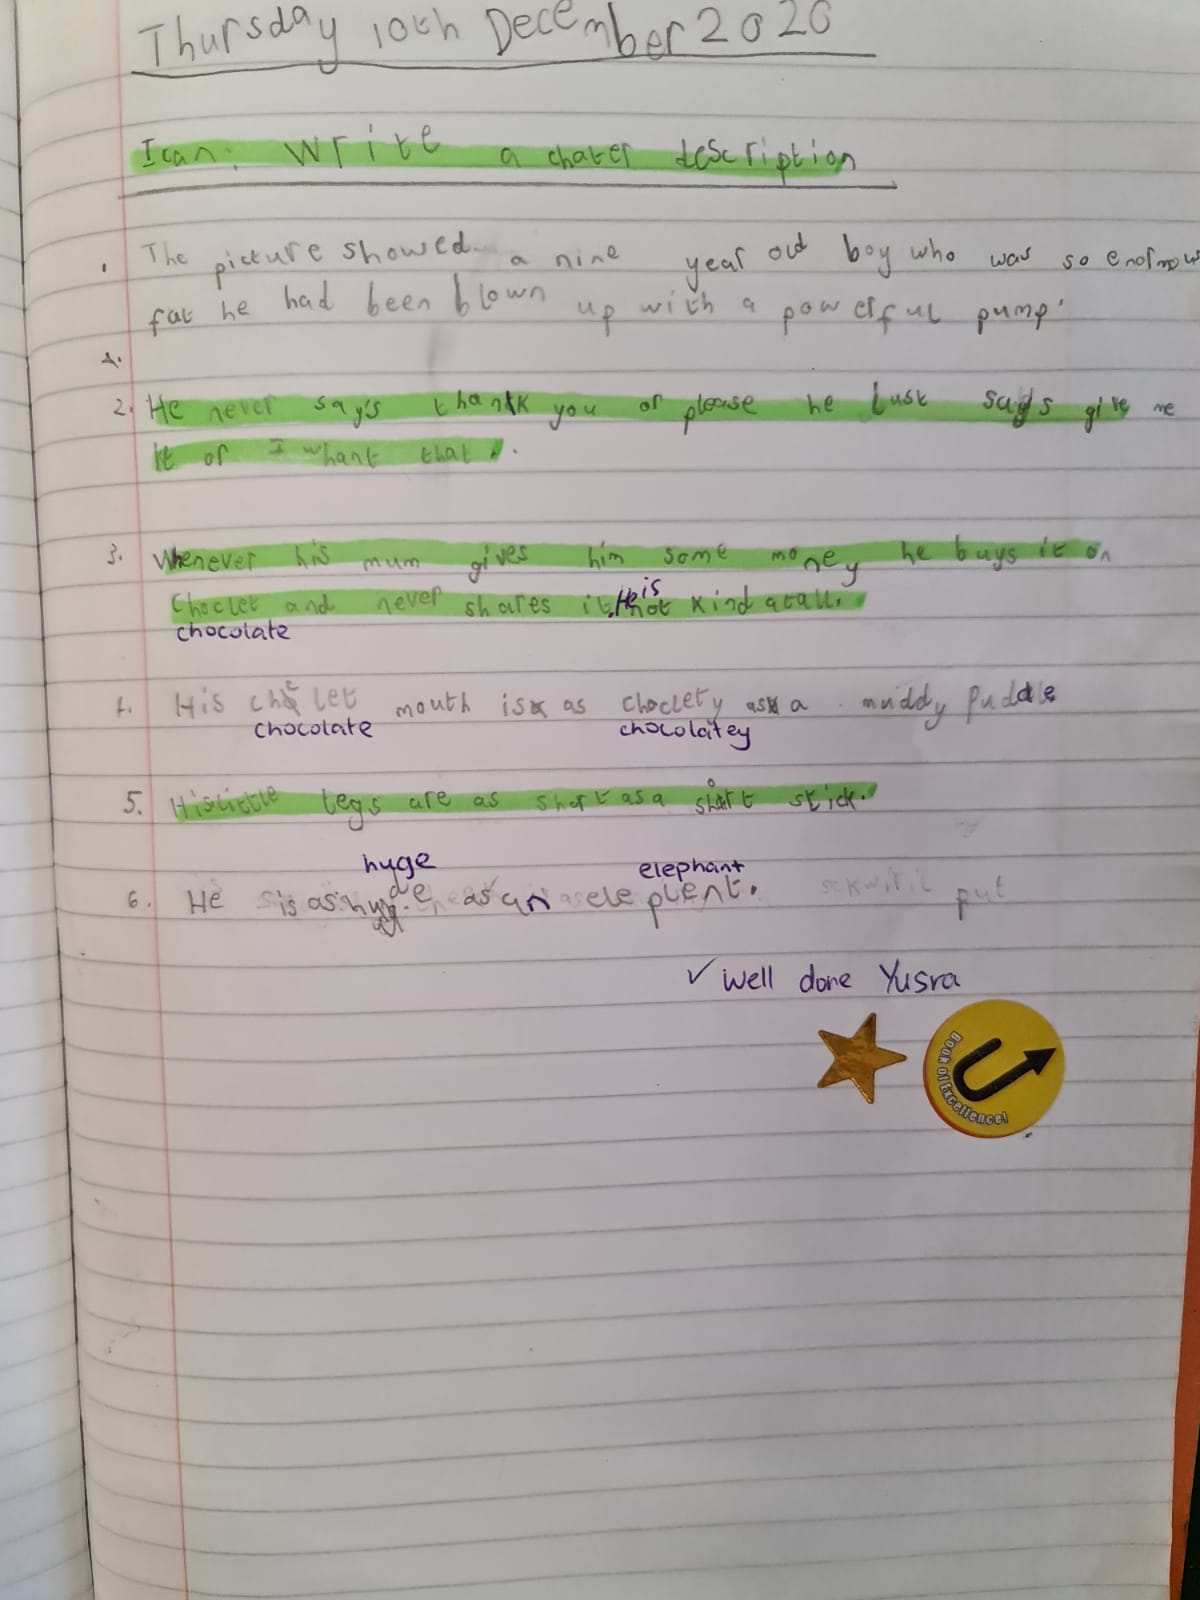 Yusra's wonderful writing!